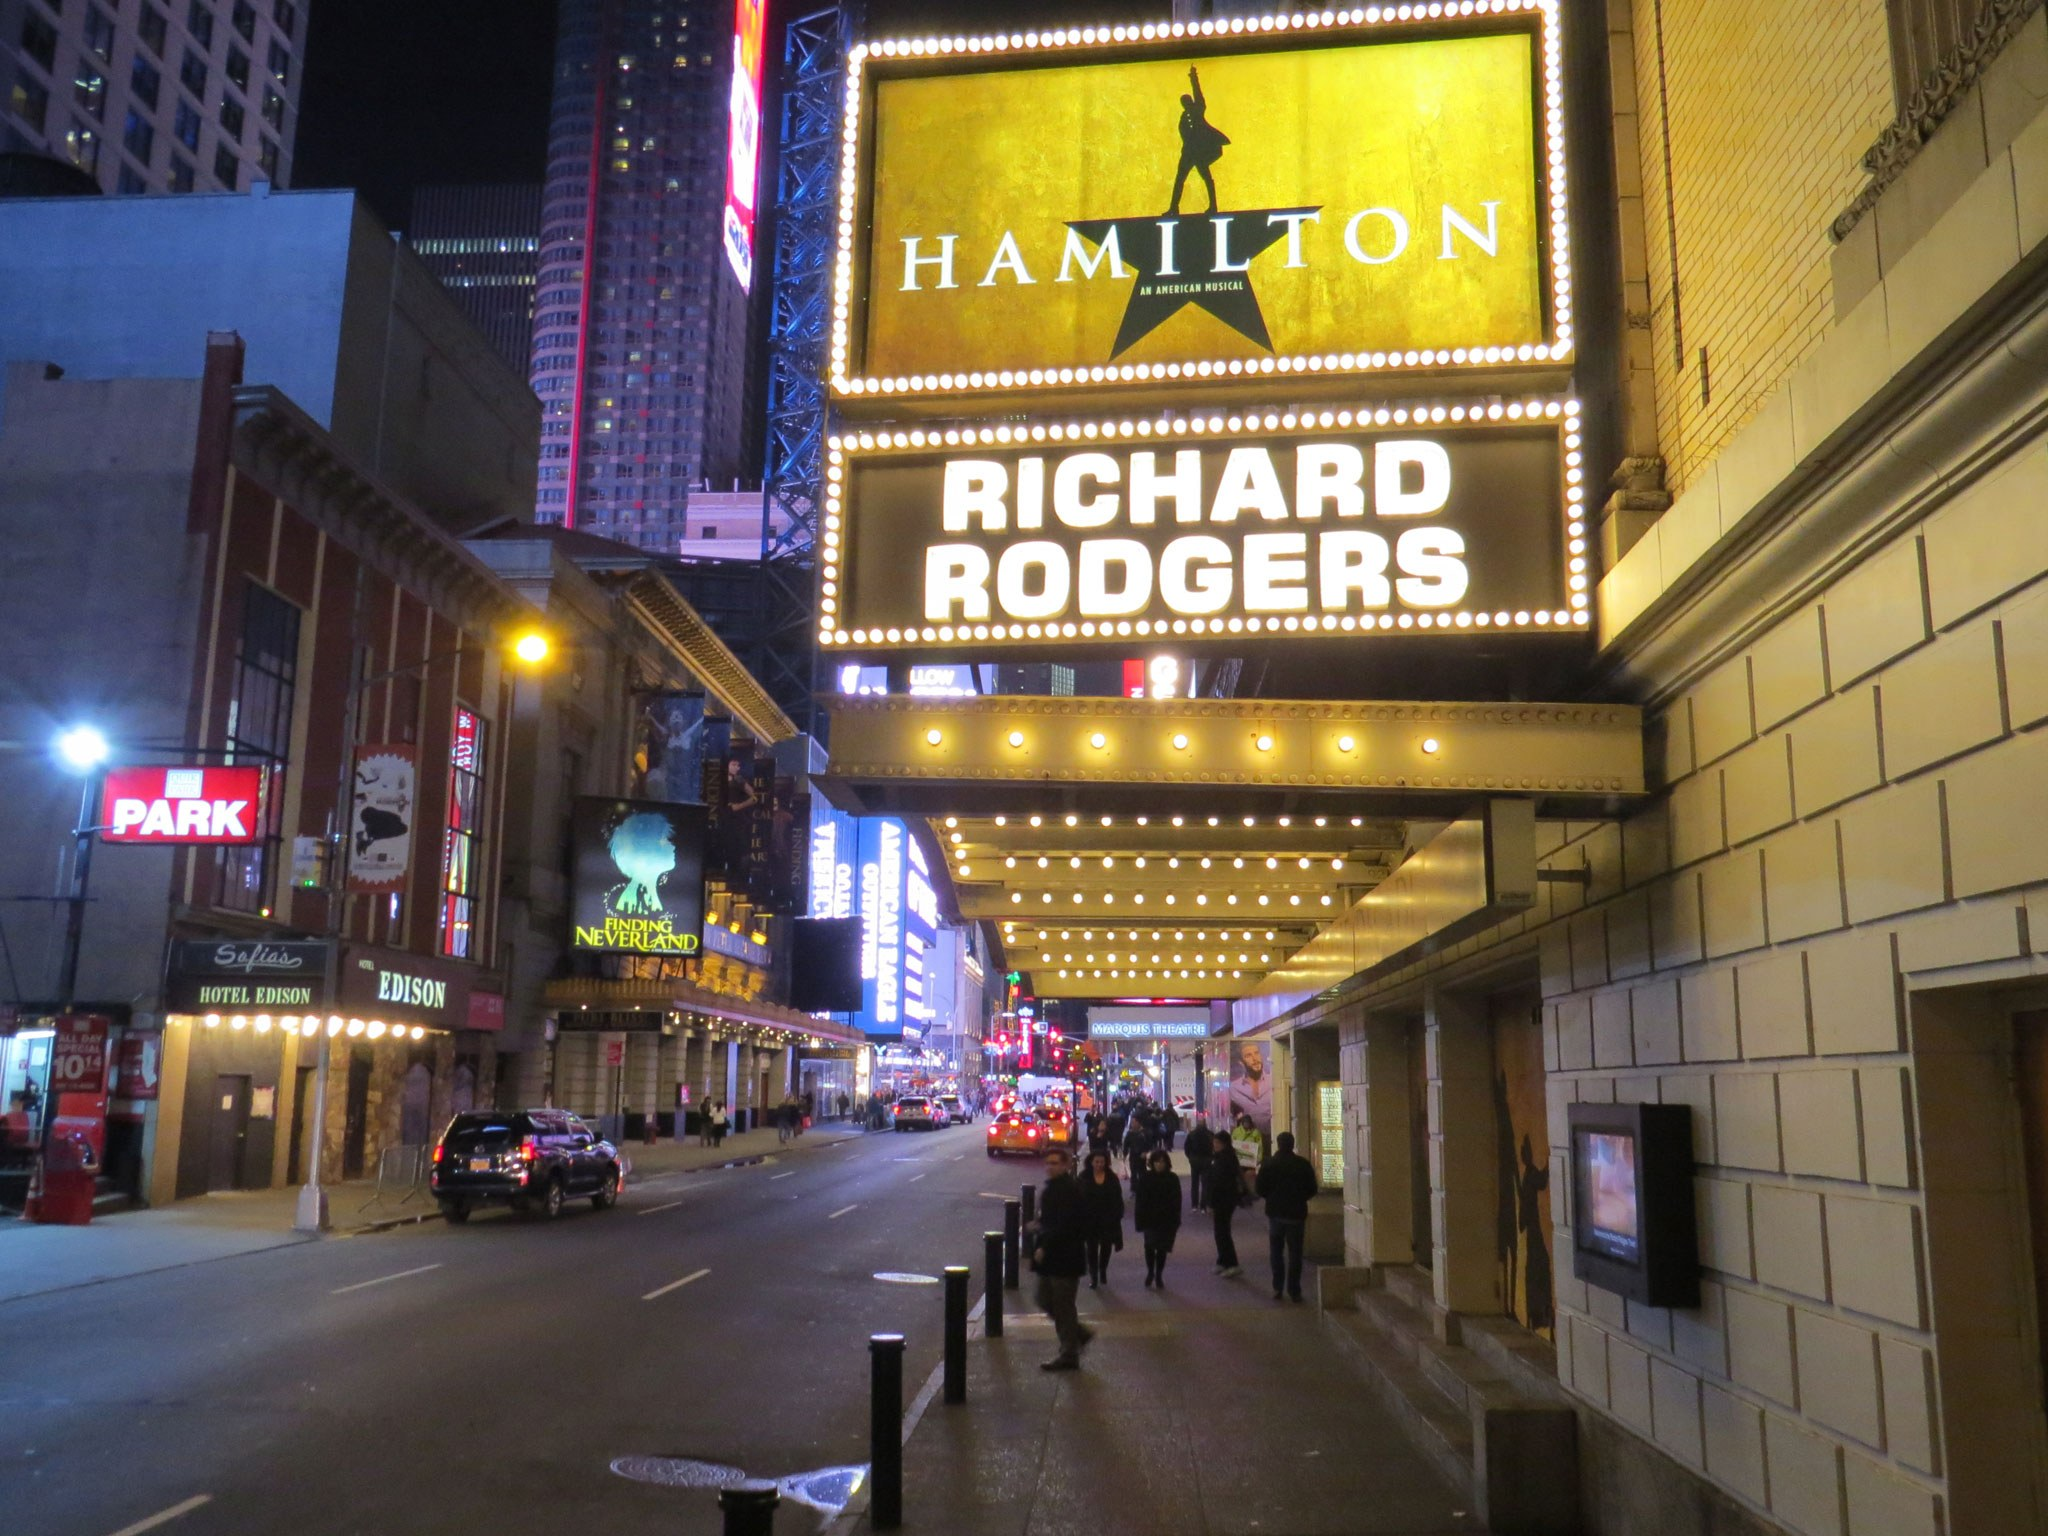 Hamilton Theatre Marquee on Broadway